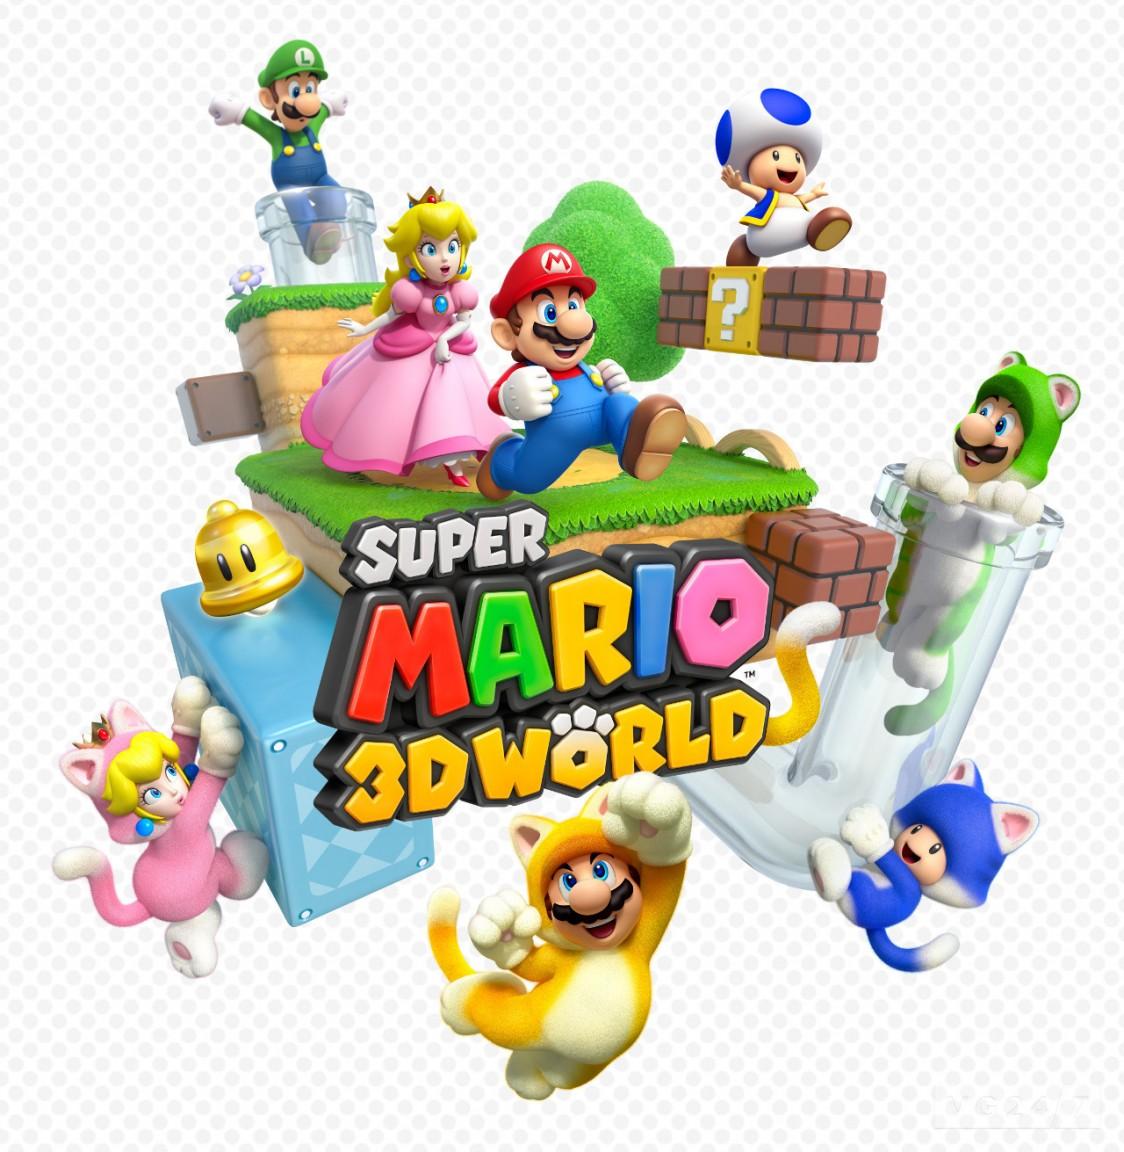 Super-Mario-3D-World-promo